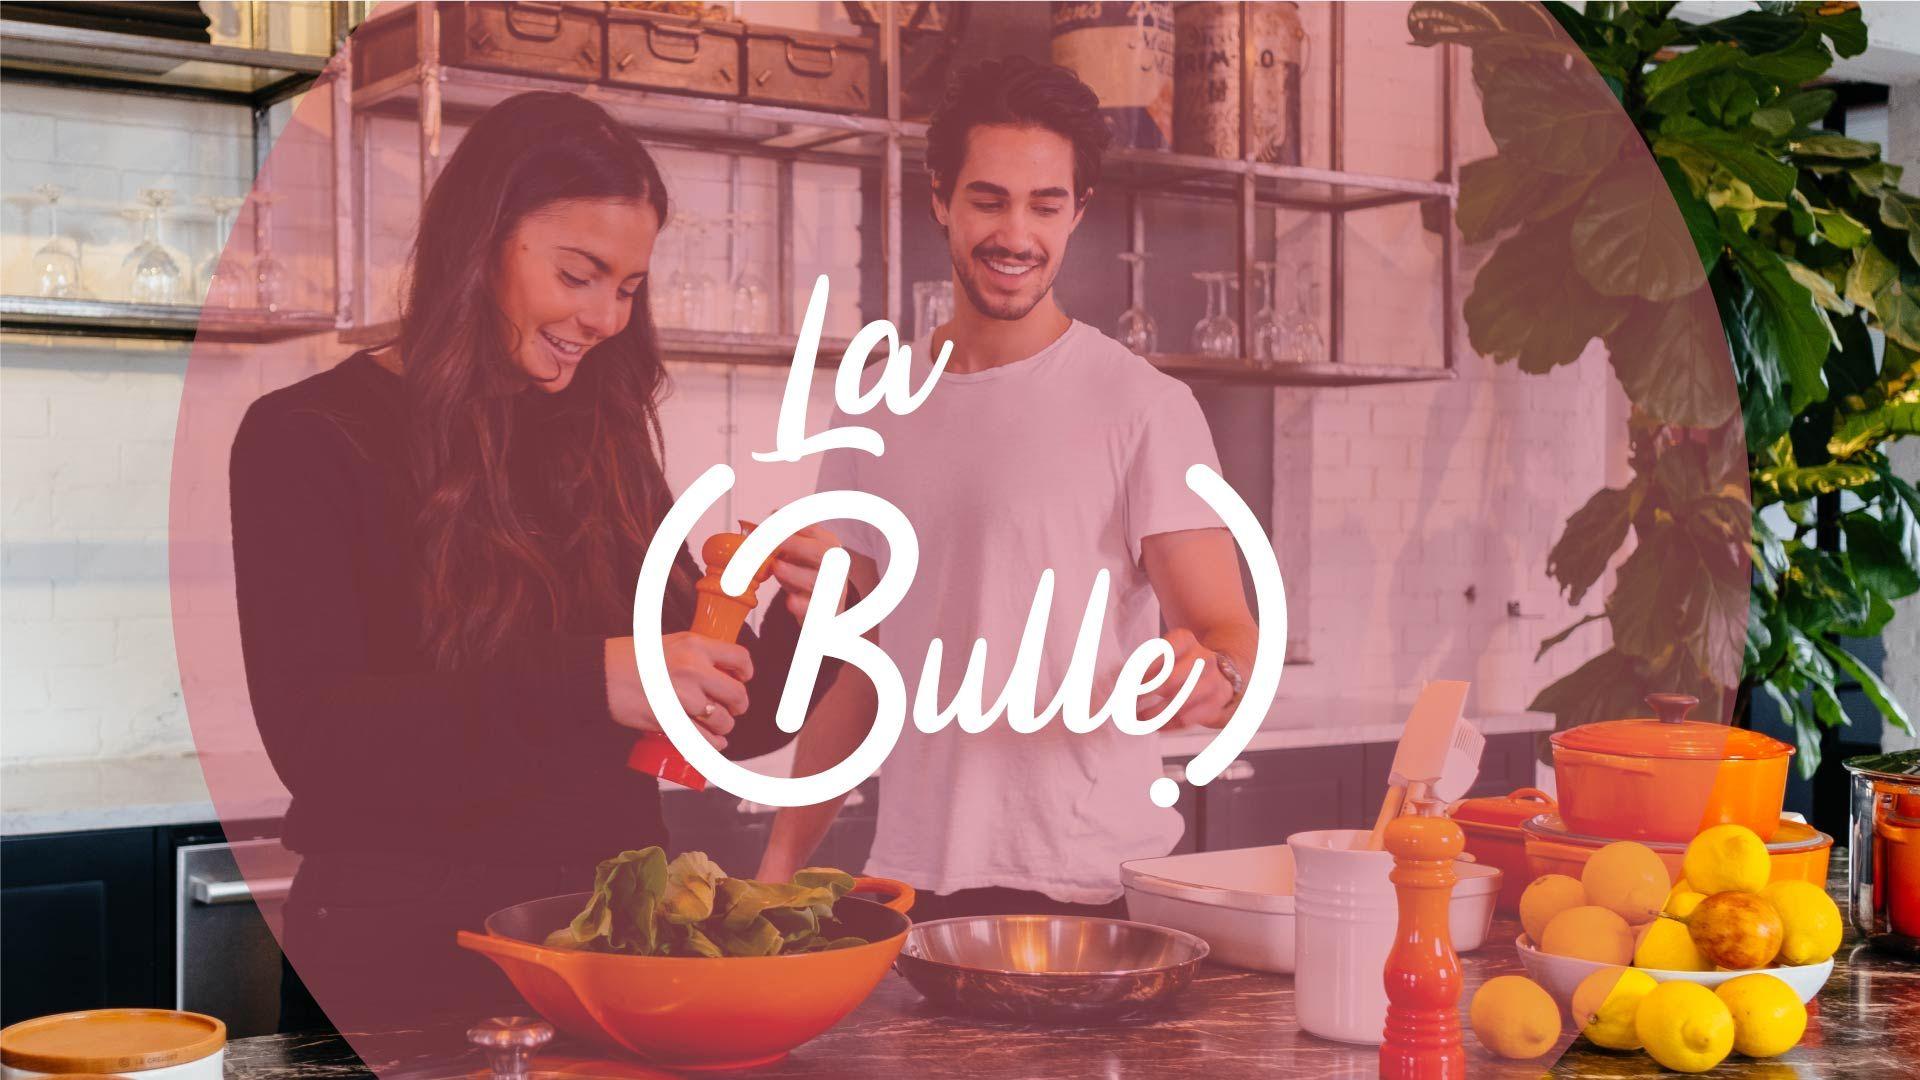 <span>La Bulle - Branding</span>